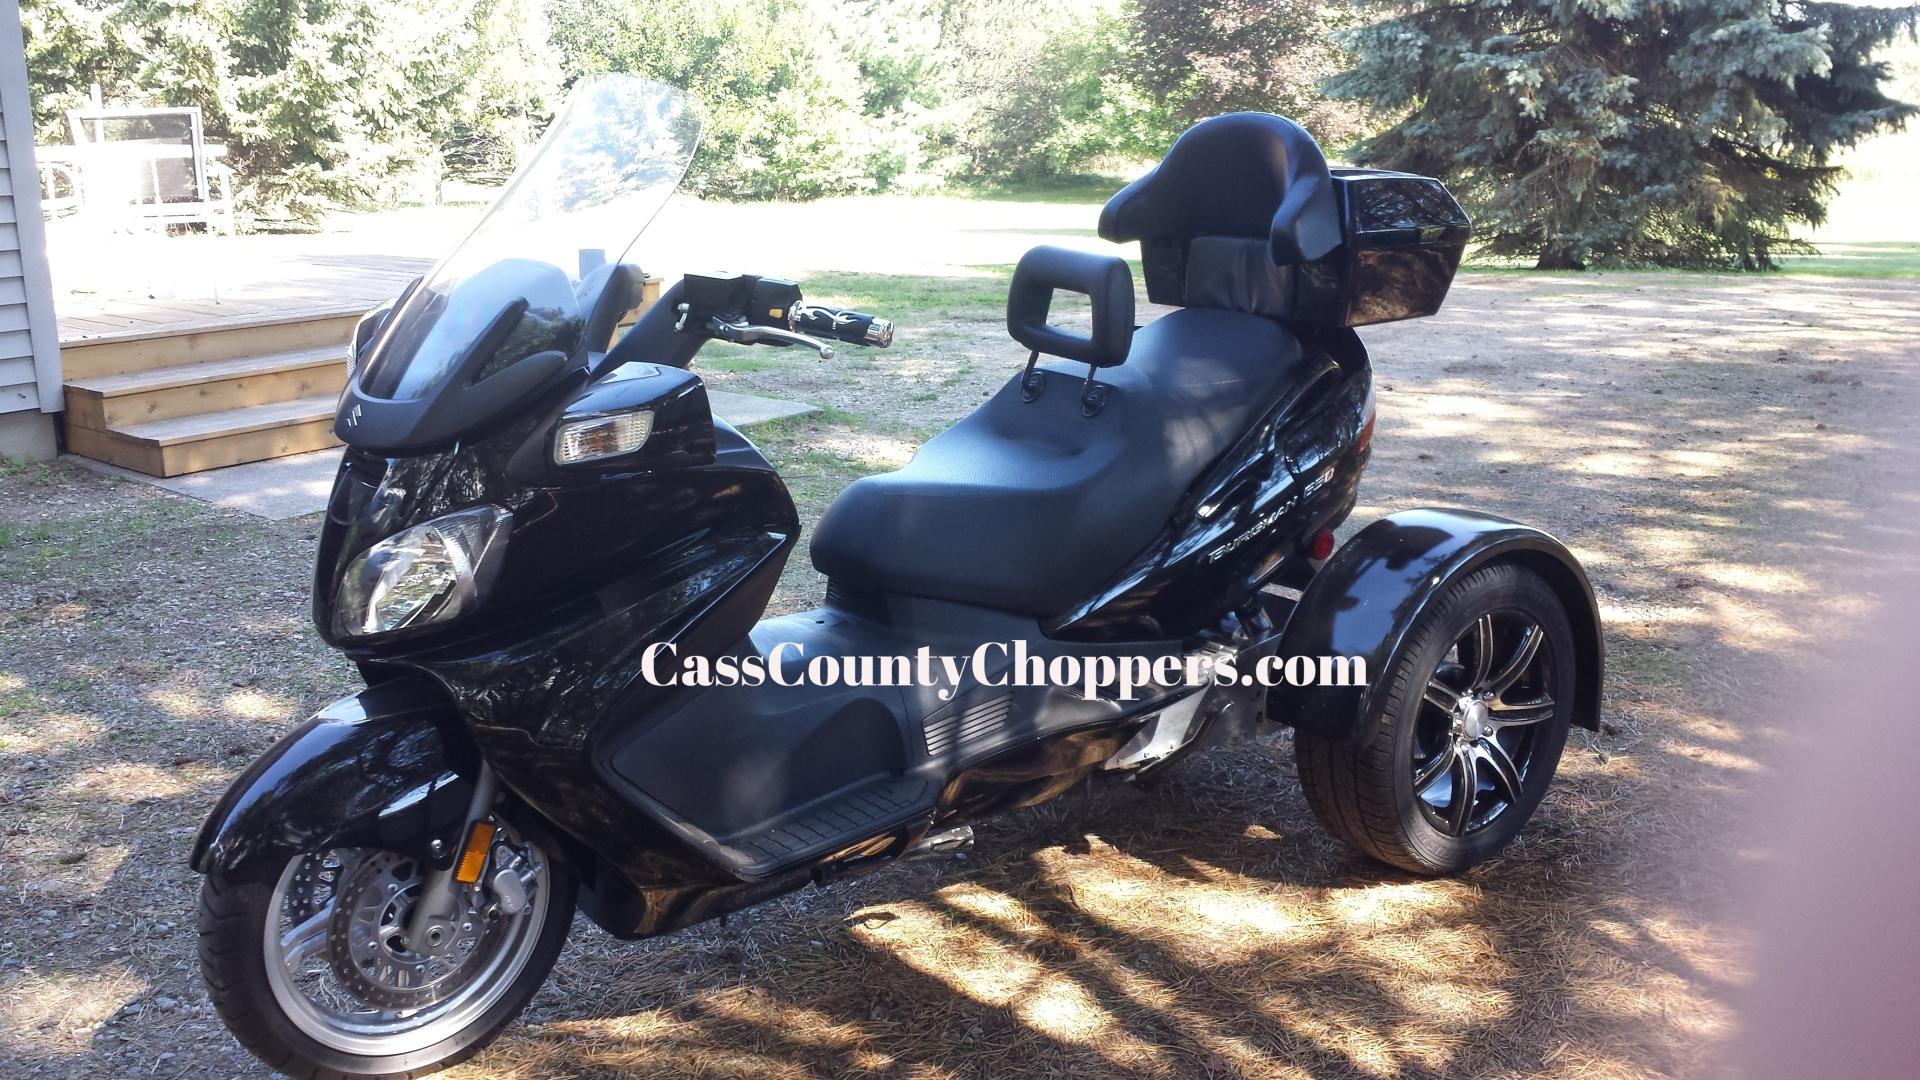 Black Suzuki Burgman motorcycle converted to trike with conversion kit.